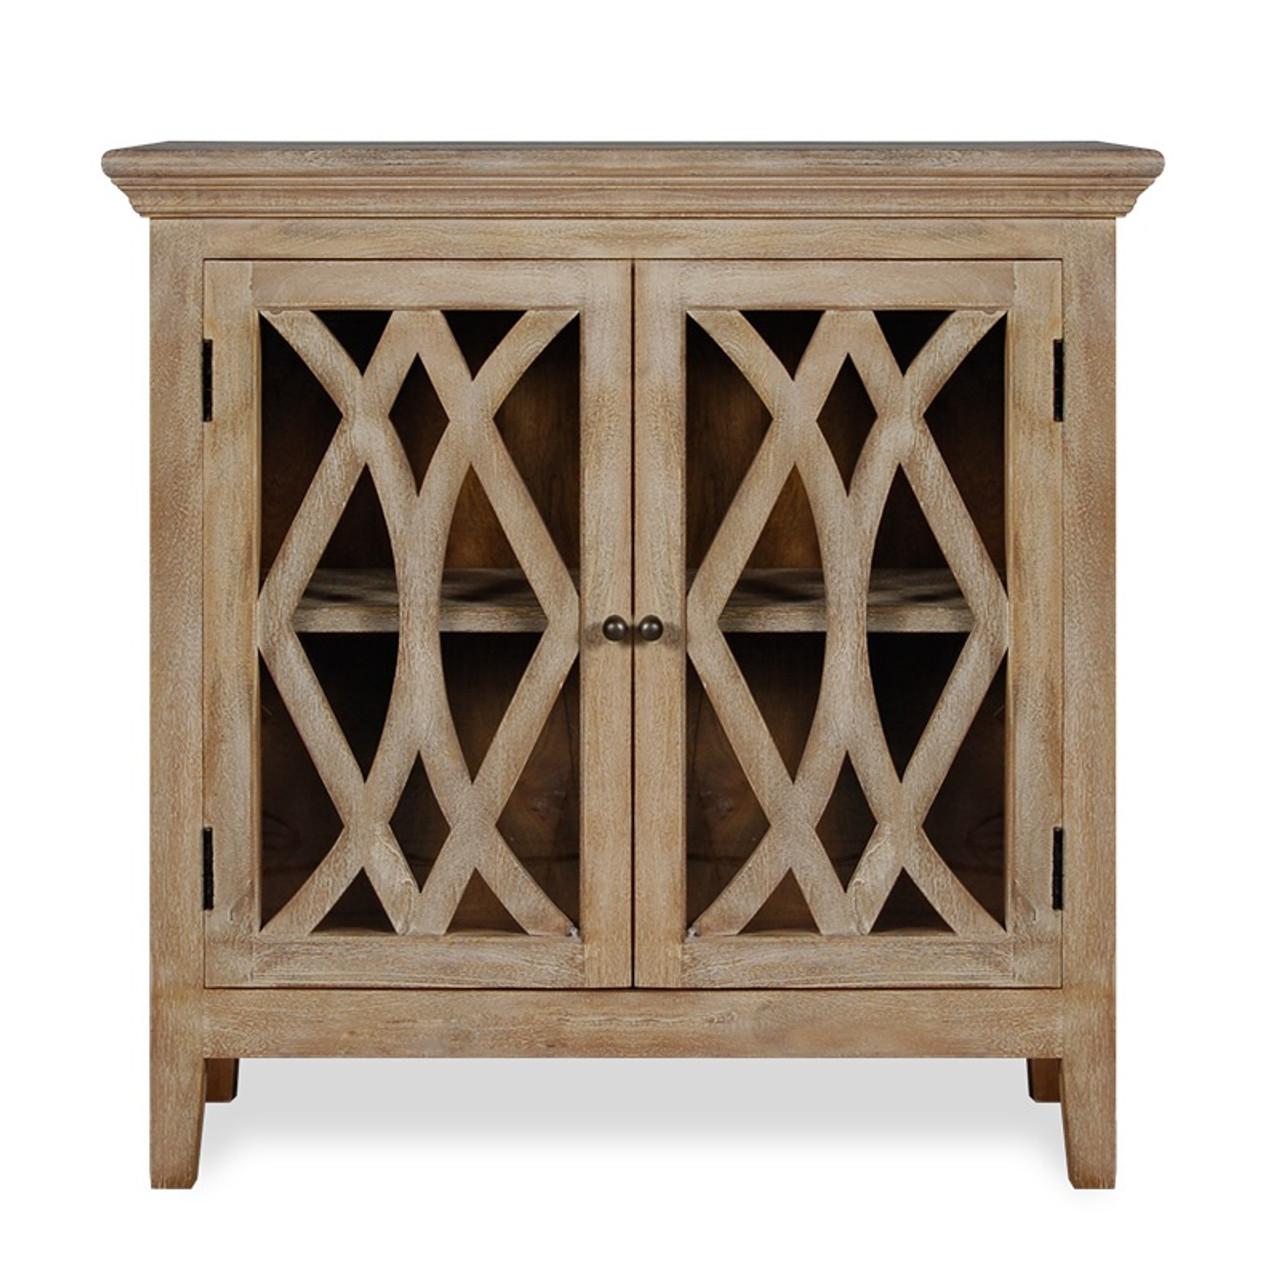 somerset small wood sideboard buffet zin home rh zinhome com Black Sideboards and Buffets IKEA Sideboards and Buffets